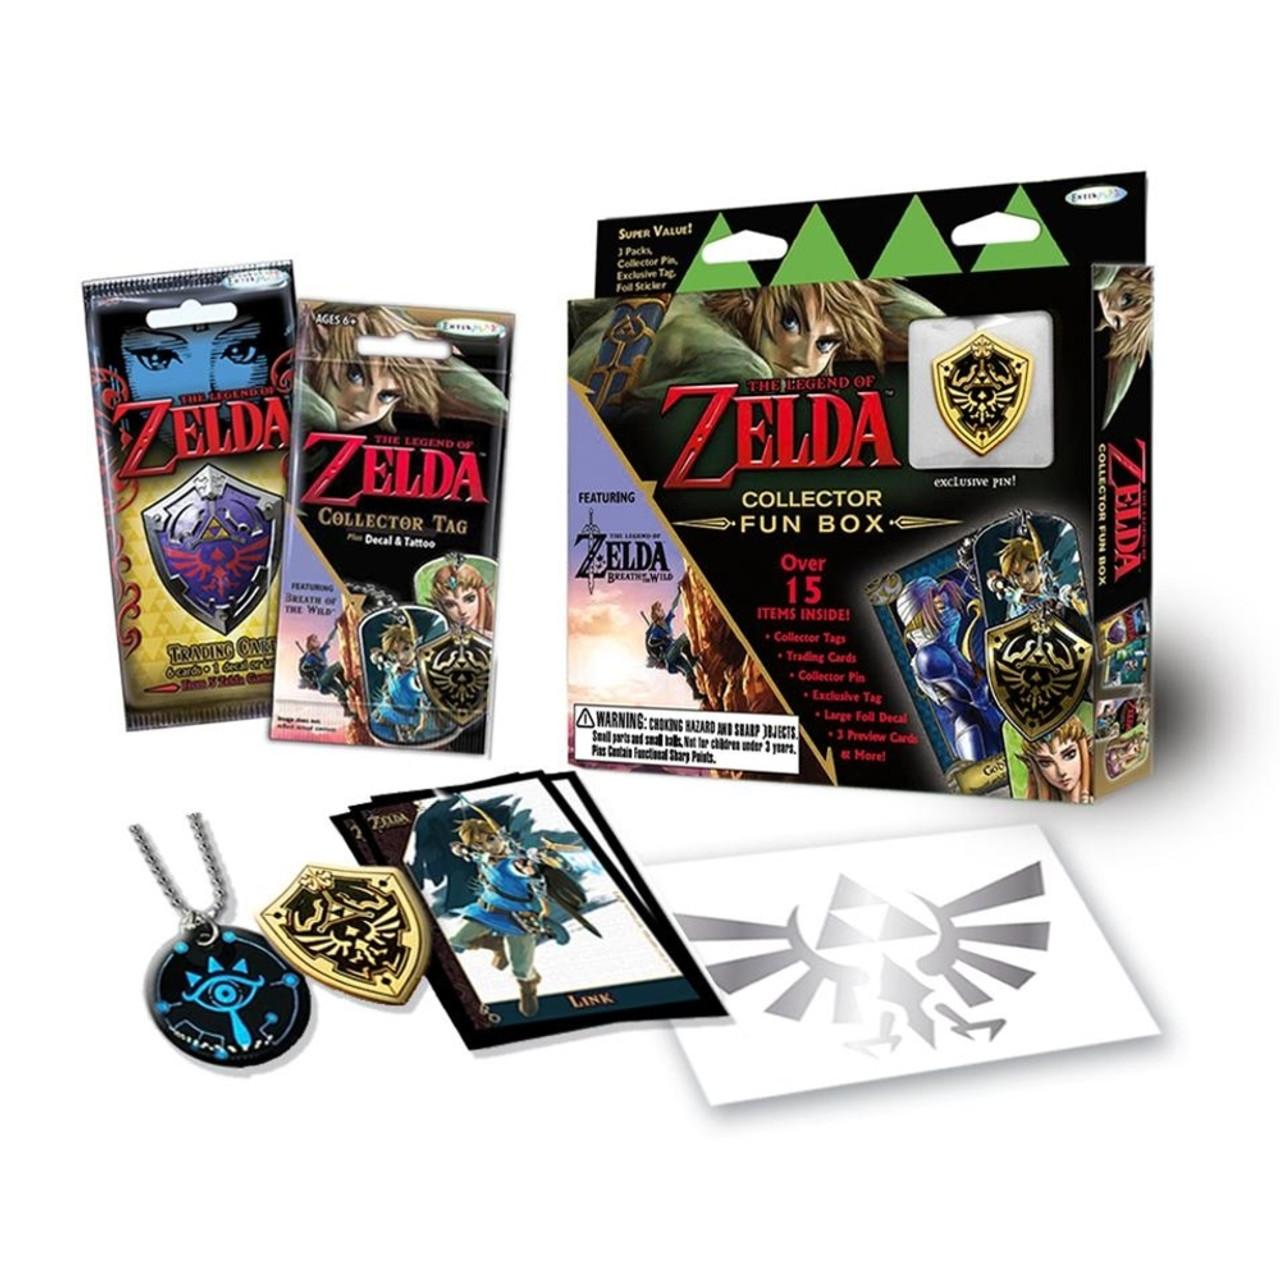 The Legend of Zelda Pins 4 Pack by BioWorld